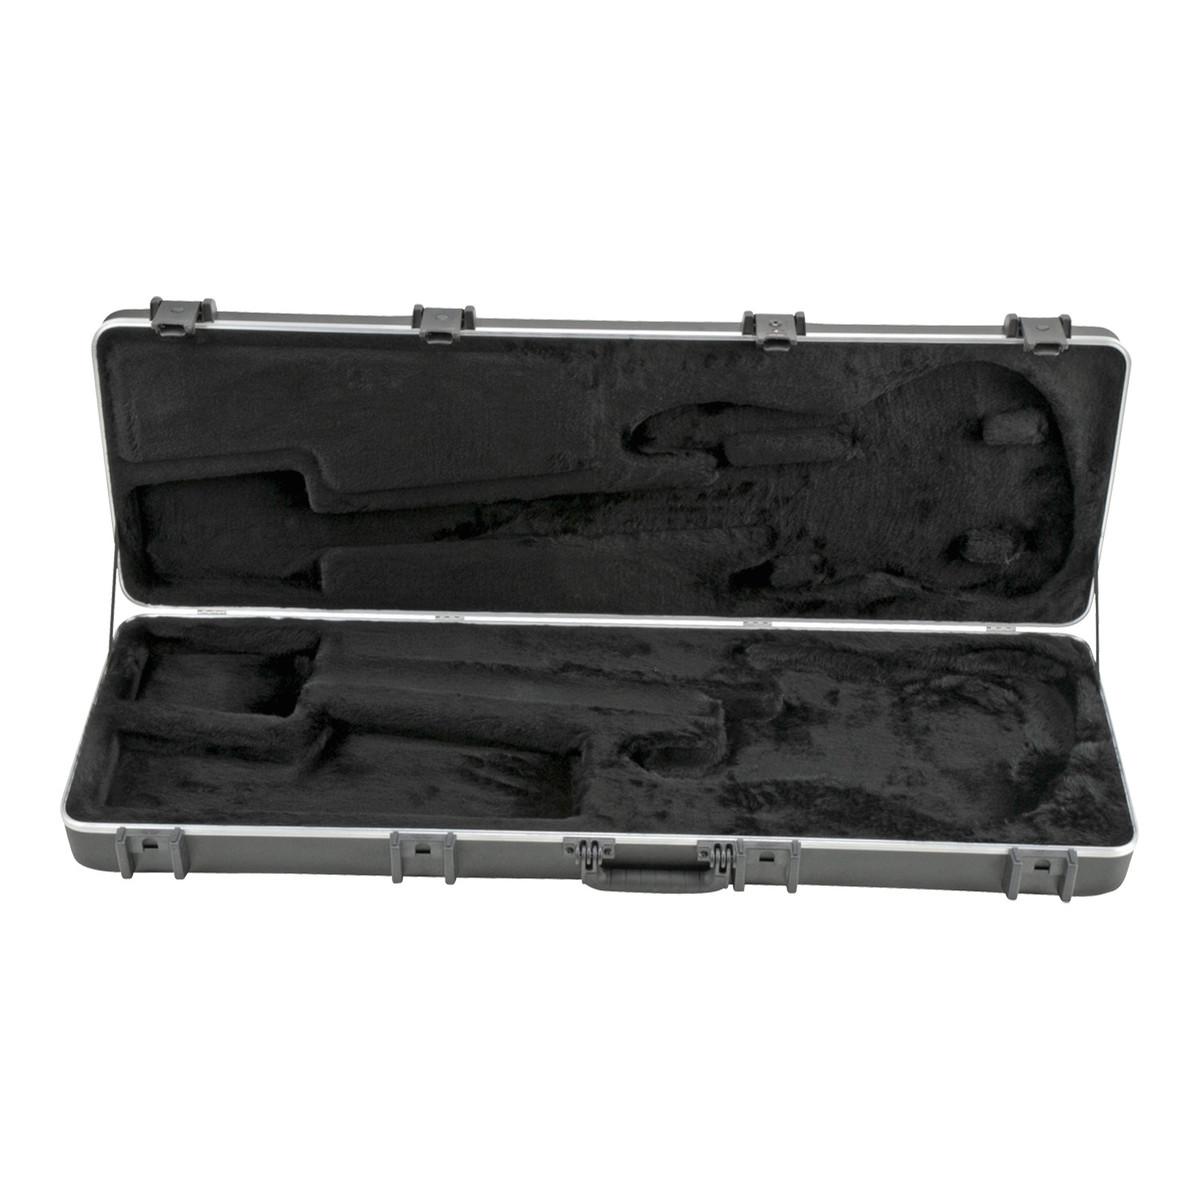 skb pro rectangular electric bass guitar case at gear4music. Black Bedroom Furniture Sets. Home Design Ideas